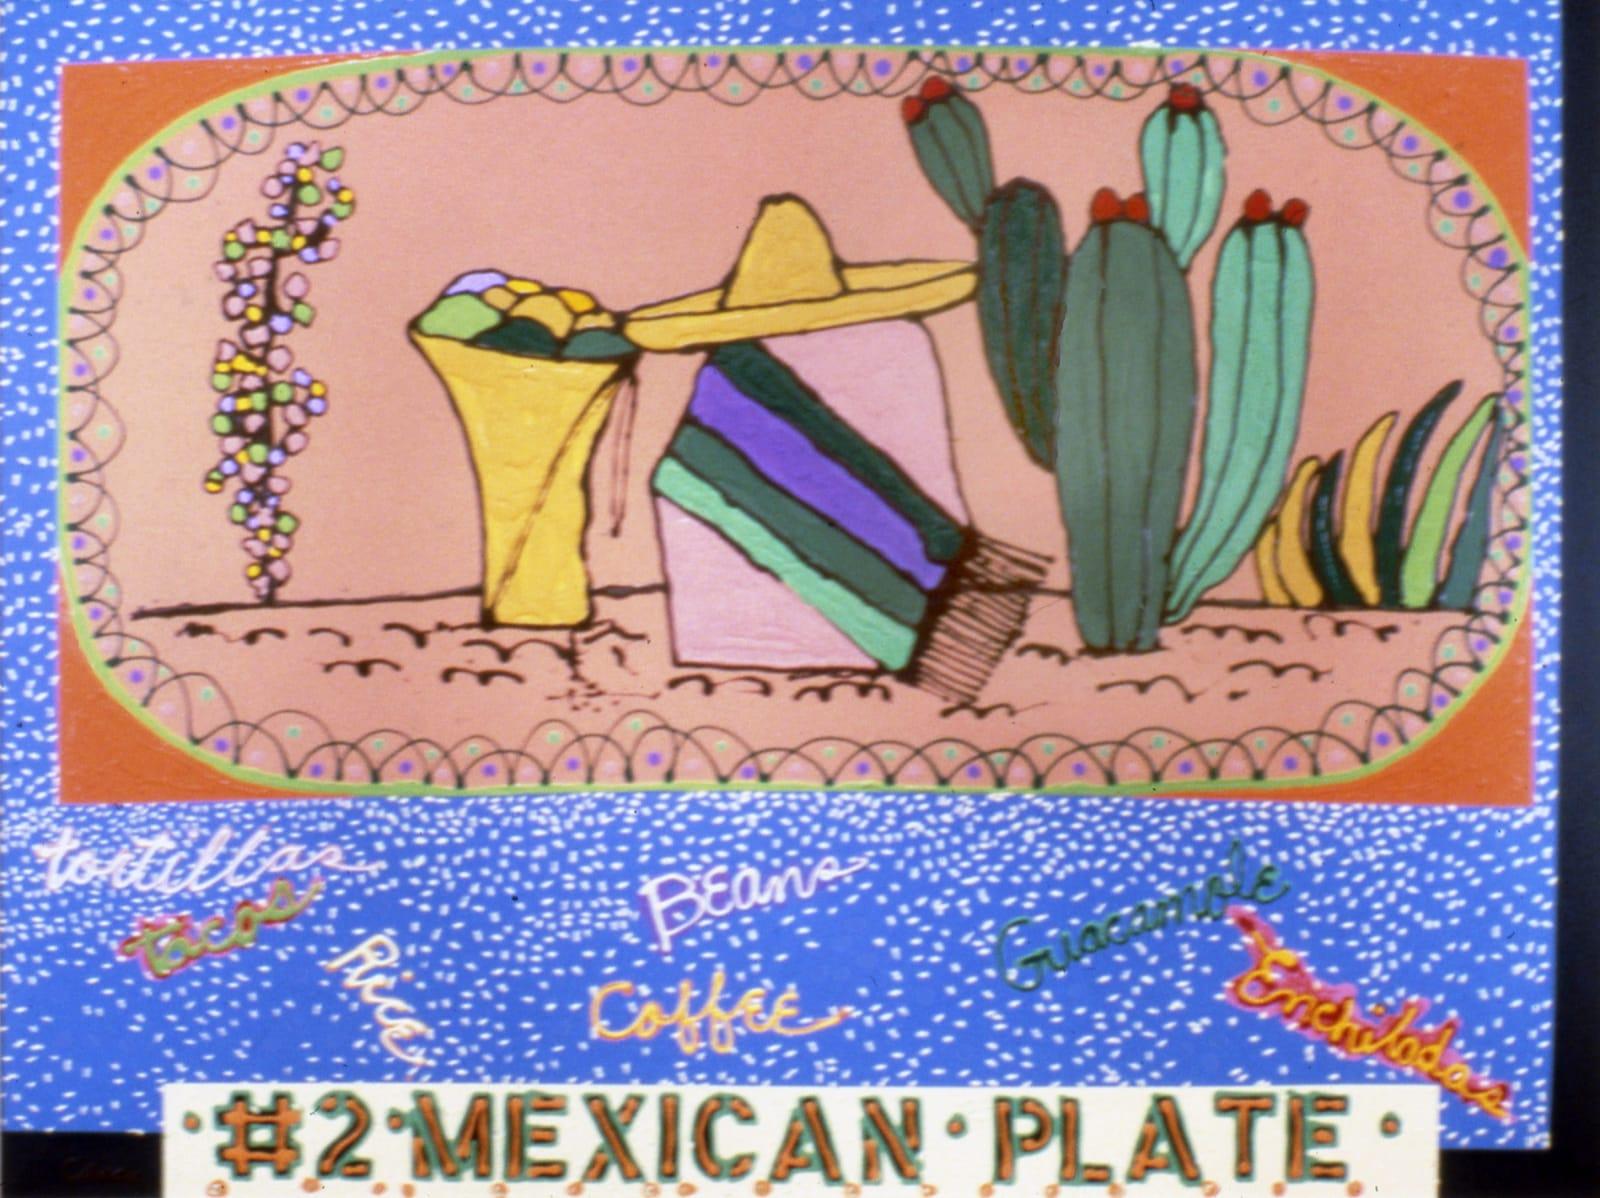 Mel Casas Humanscape 135: #2 Mexican Plate, 1984-09-01